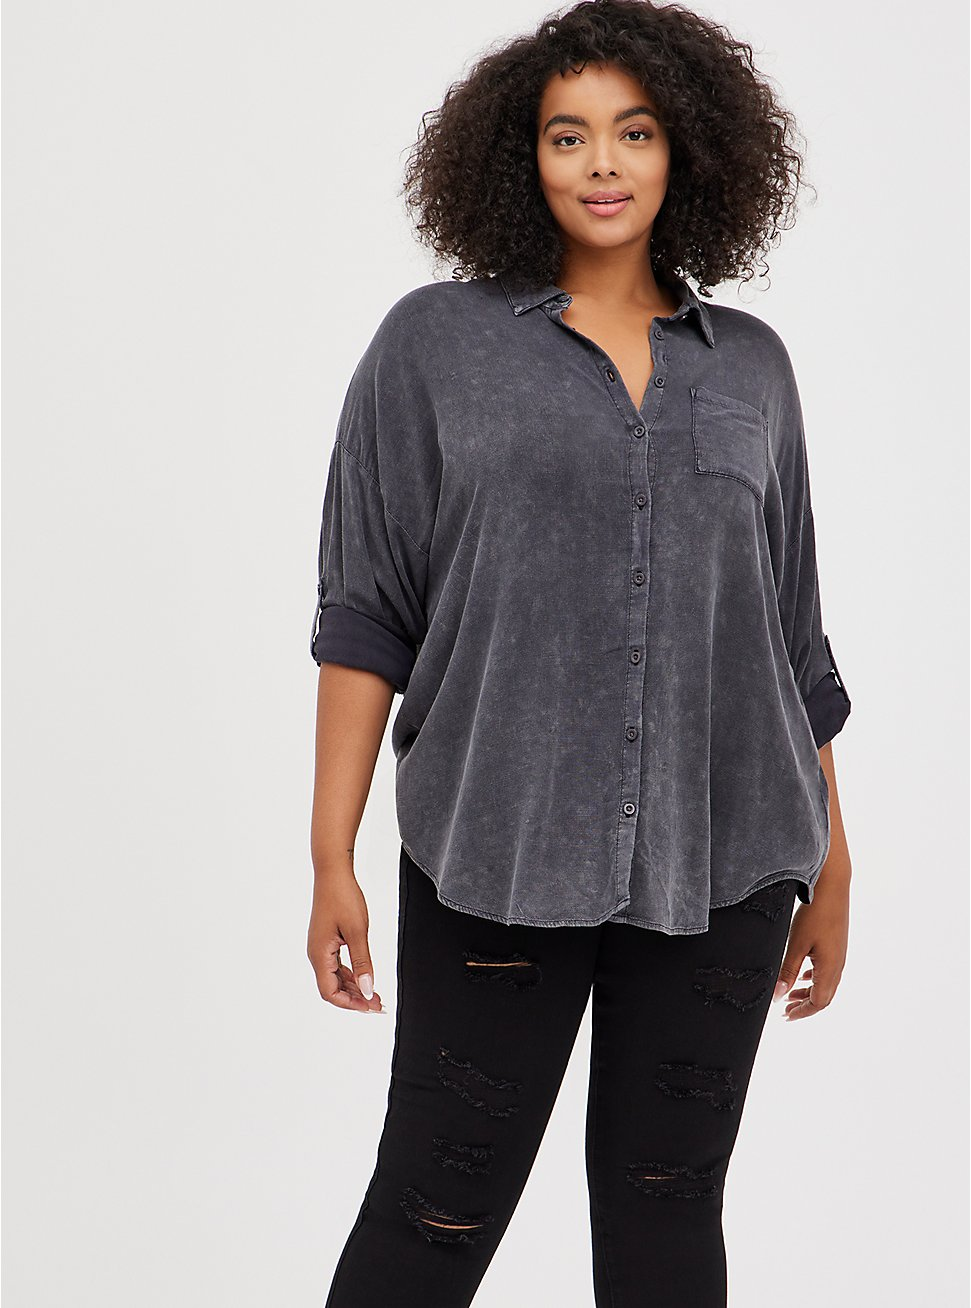 Drop Shoulder Button-Front Top - Mineral Wash Grey, NINE IRON, hi-res